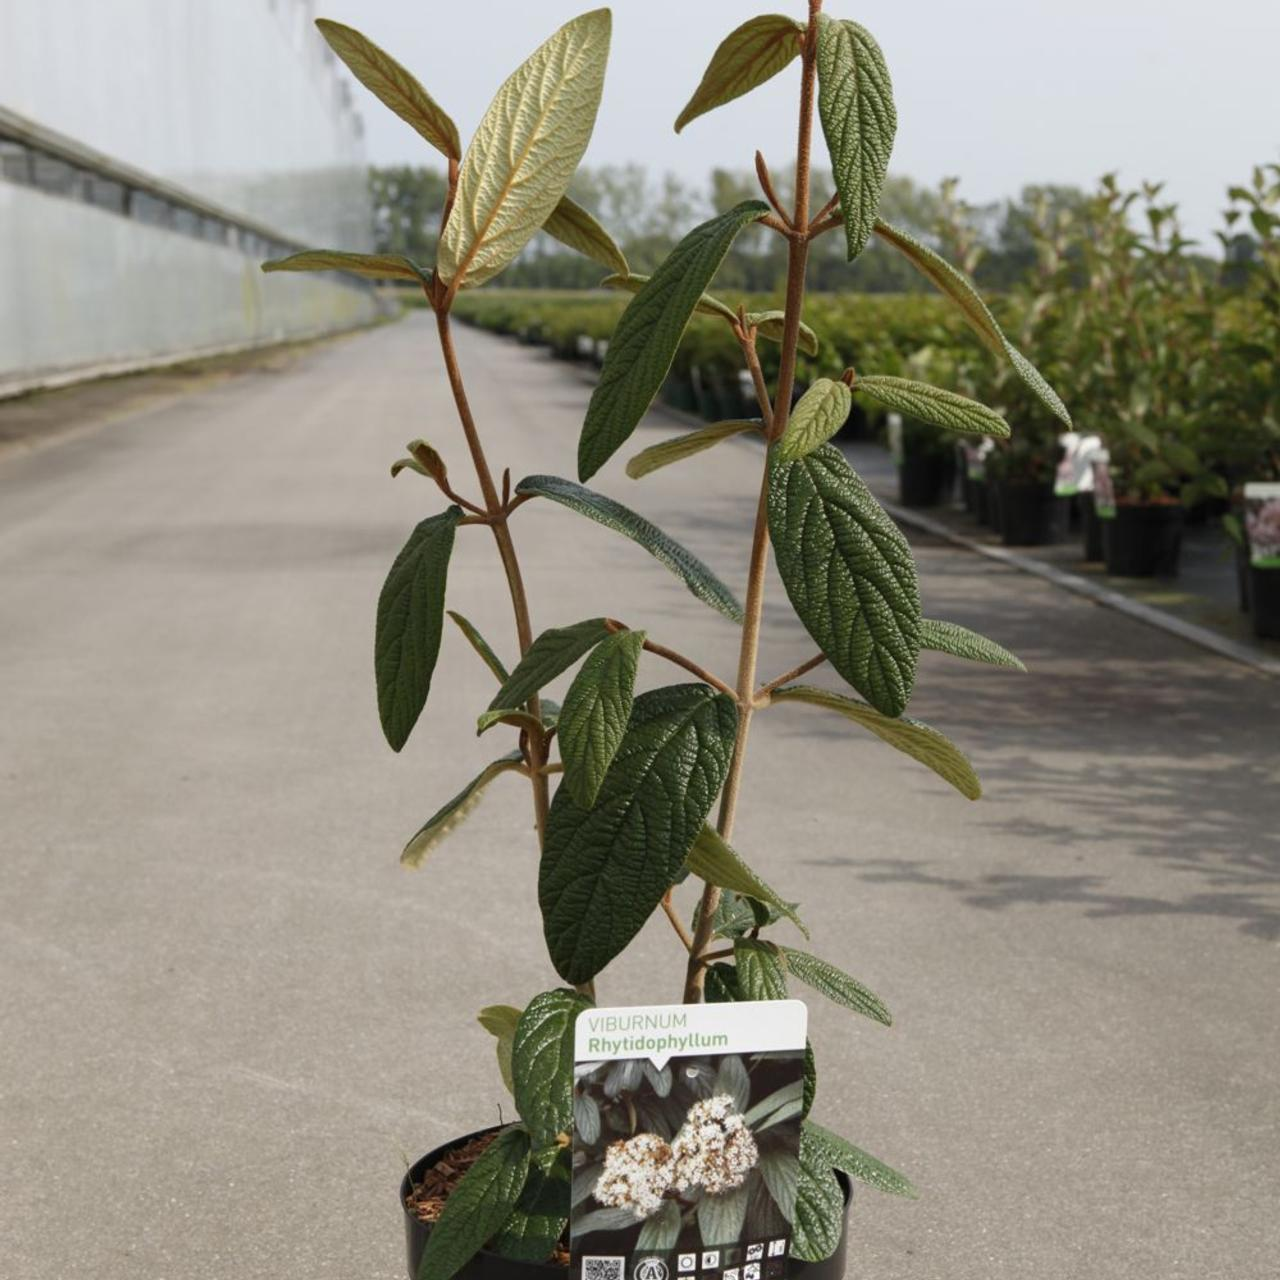 Viburnum rhytidophyllum plant